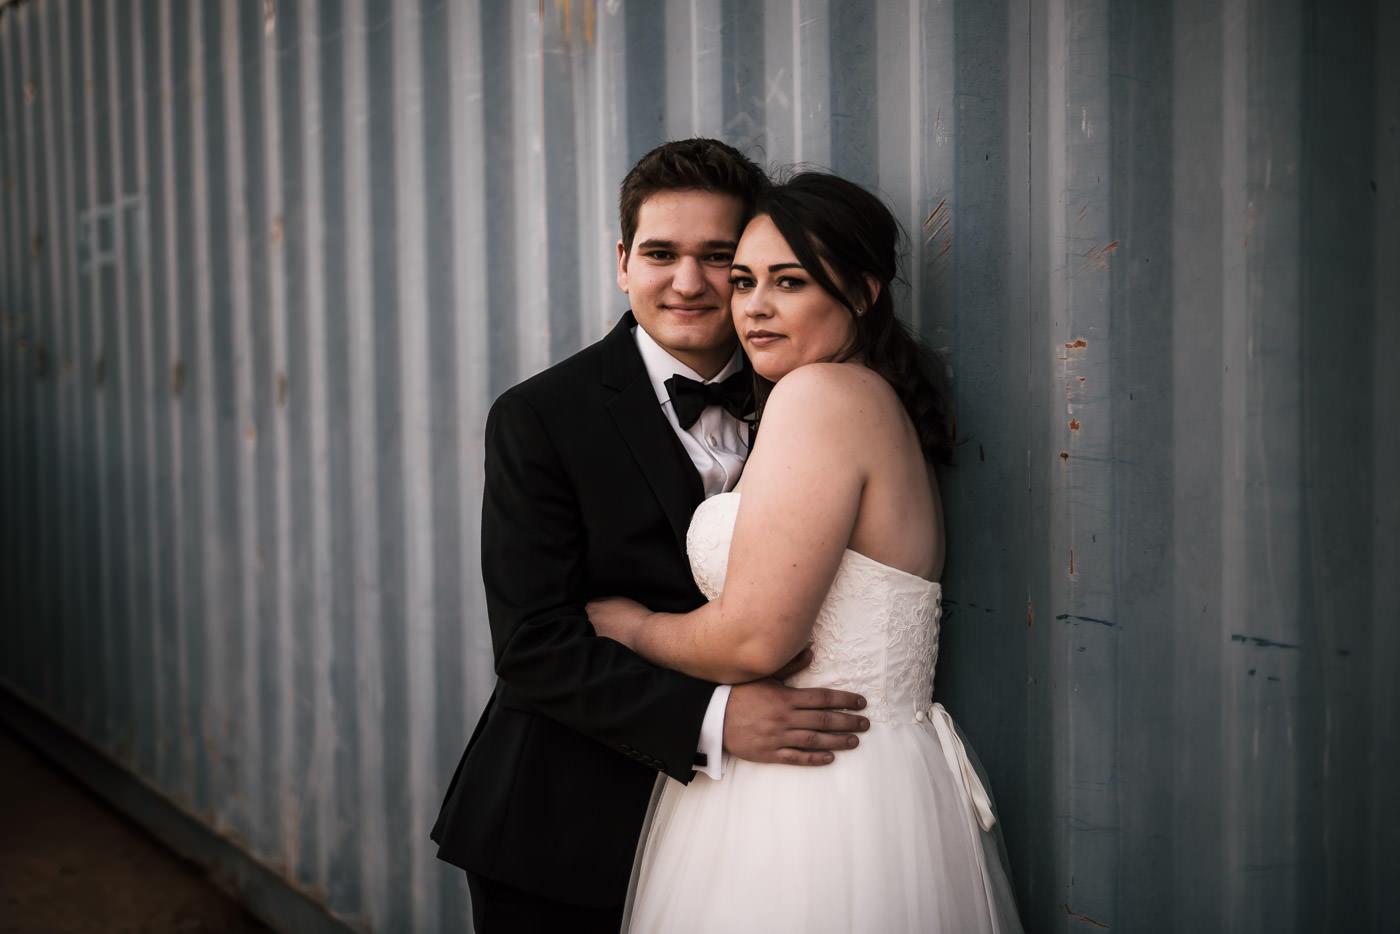 Classic wedding portrait taken by photographer in Temecula California.